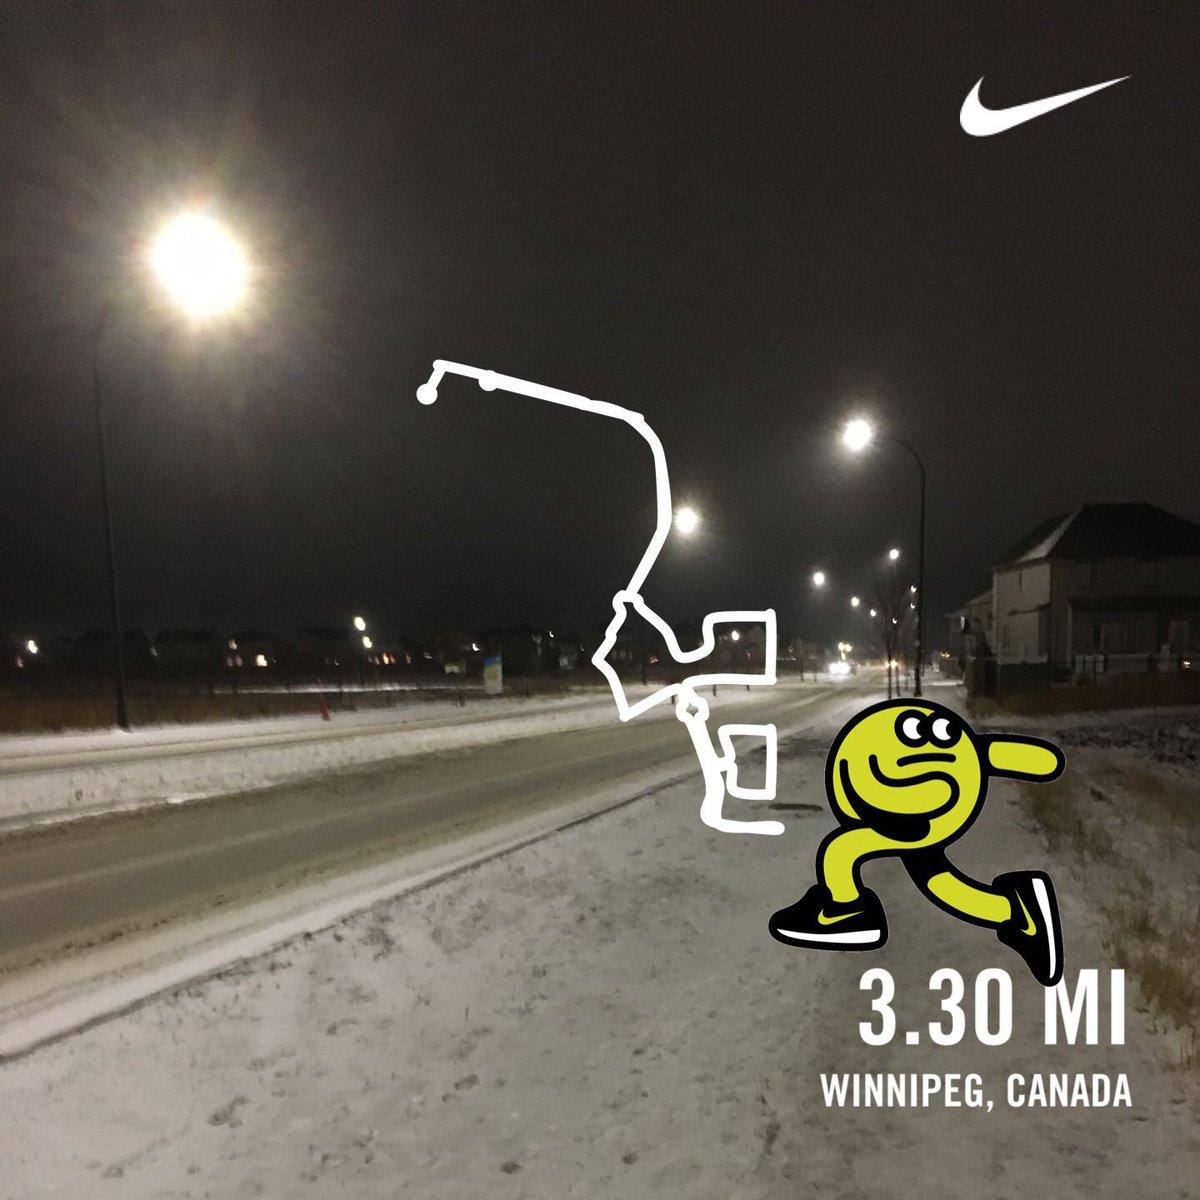 Ran 3.30 miles with Nike Run Club #movewithhart #hustlehart #moonshot @NikeService